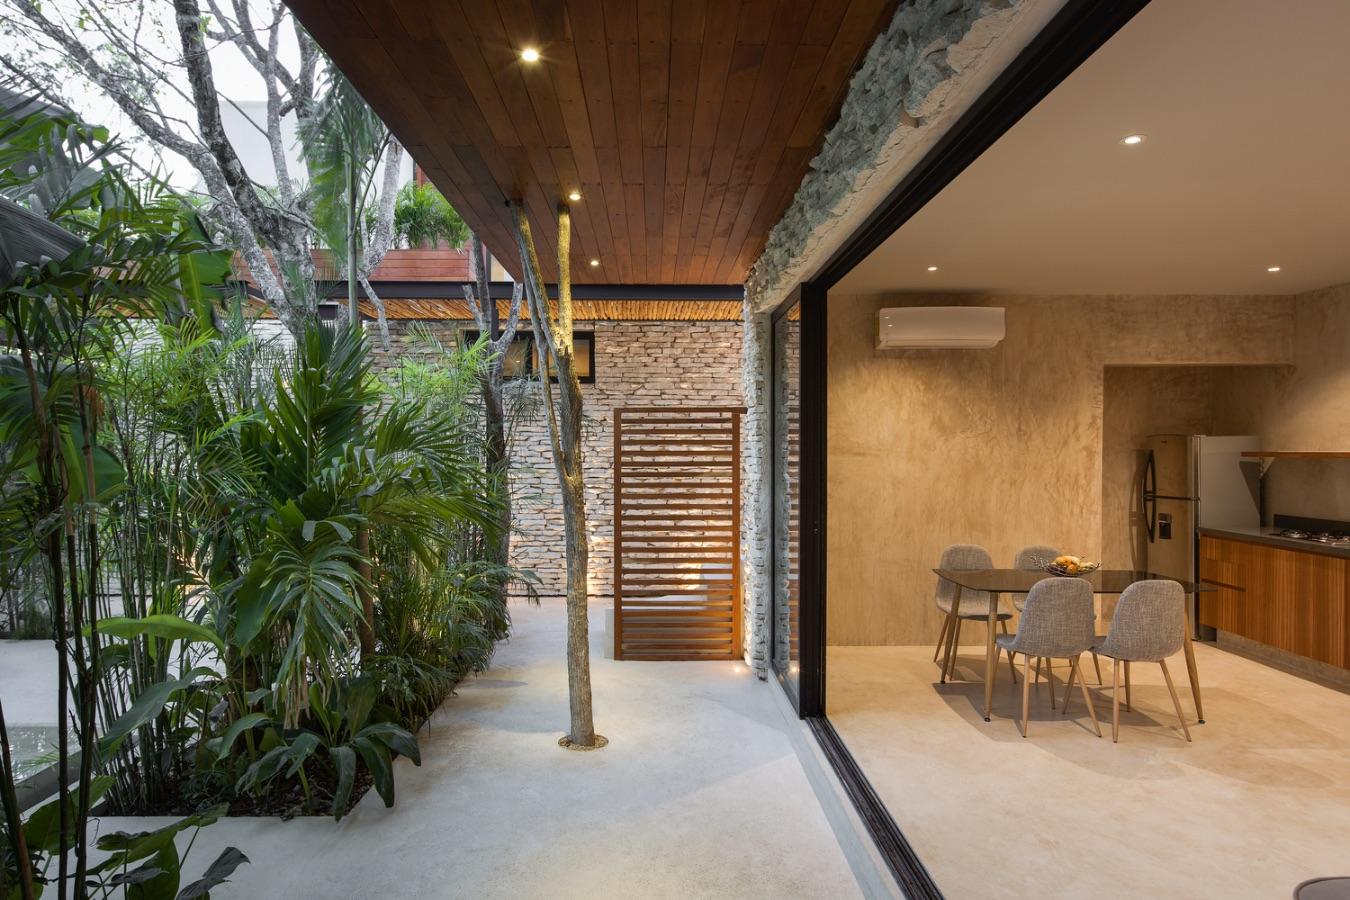 2_Ka'a Tulum Housing Complex_Studio Arquitectos_Inspirationist